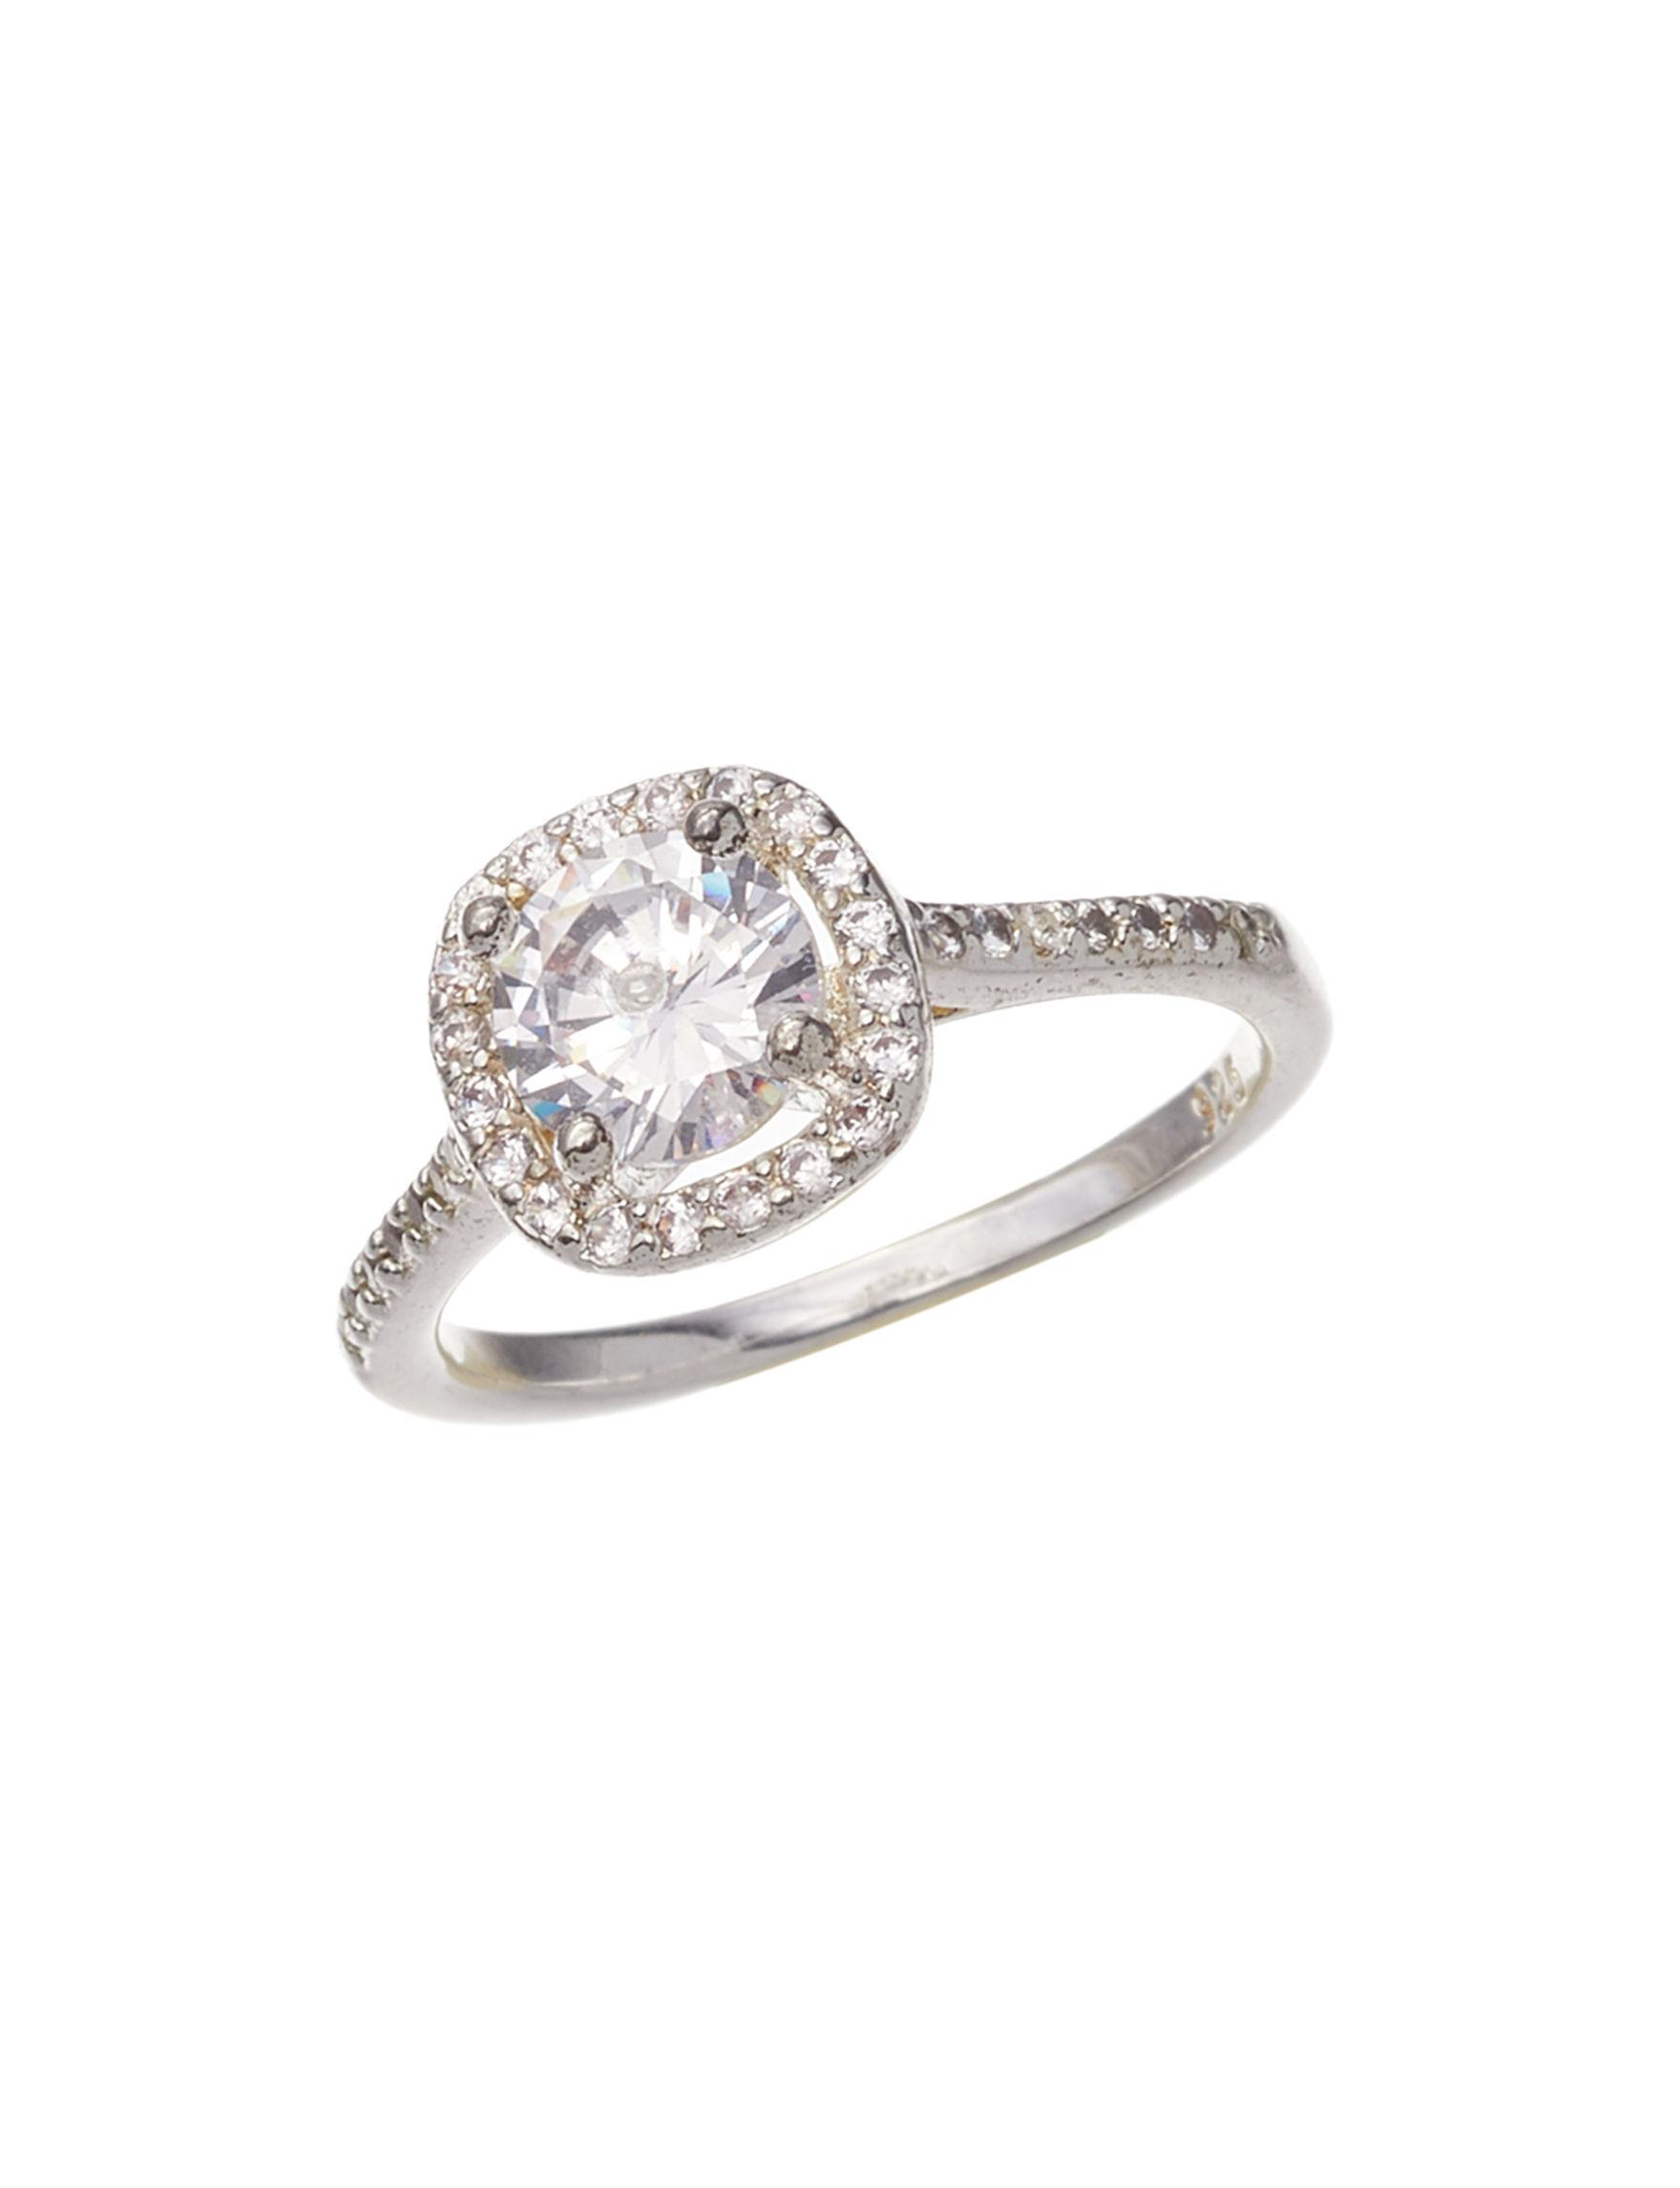 Danecraft Gold Rings Fine Jewelry